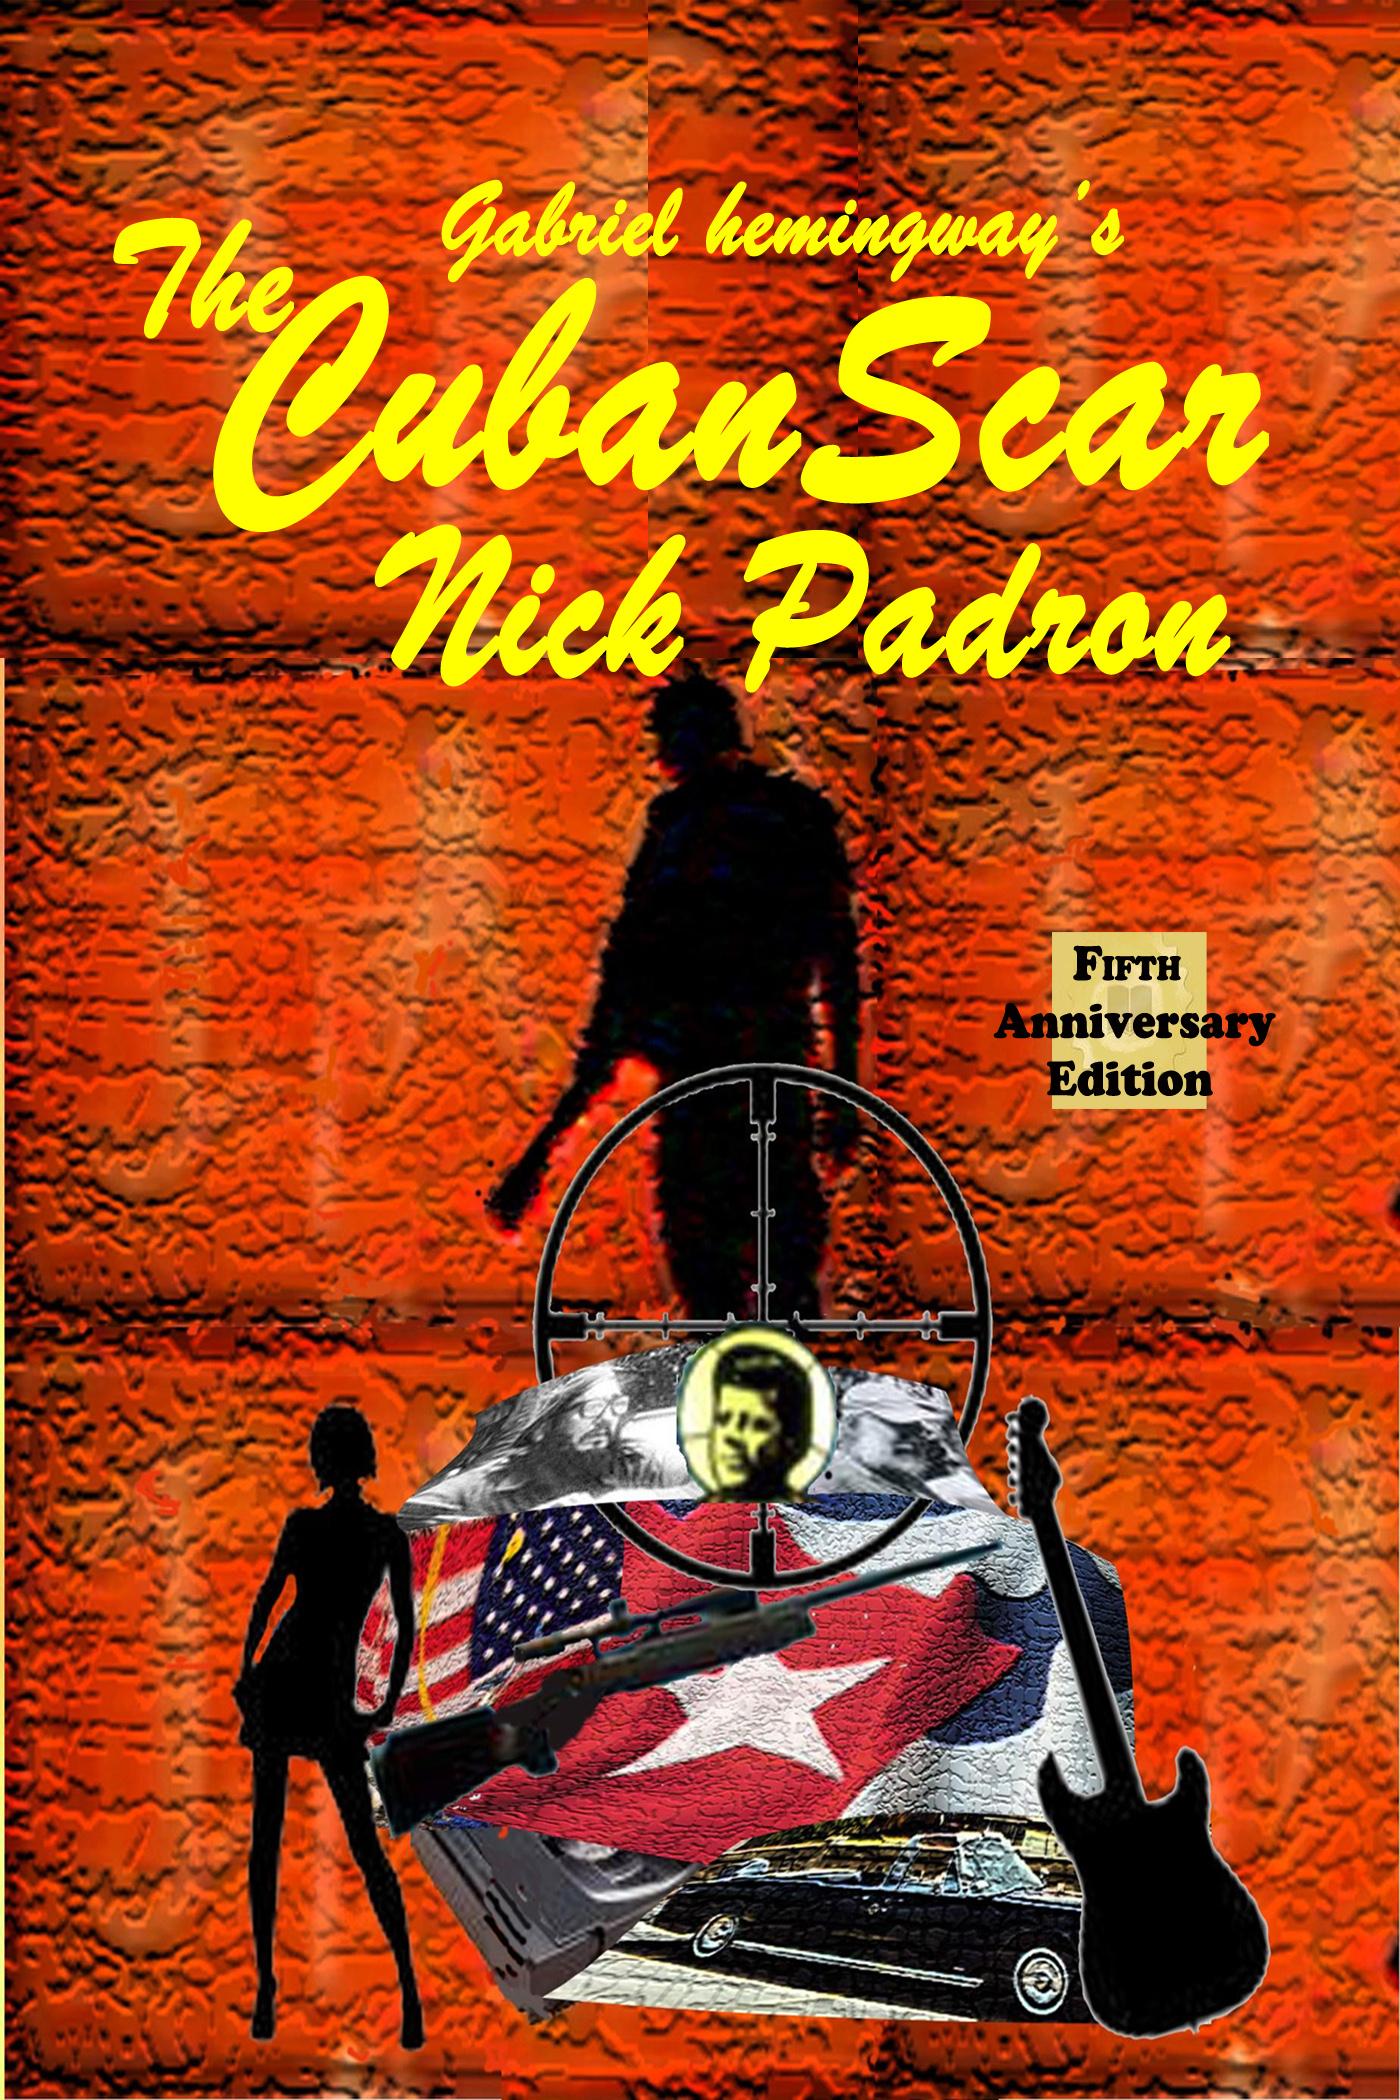 The cuban scar